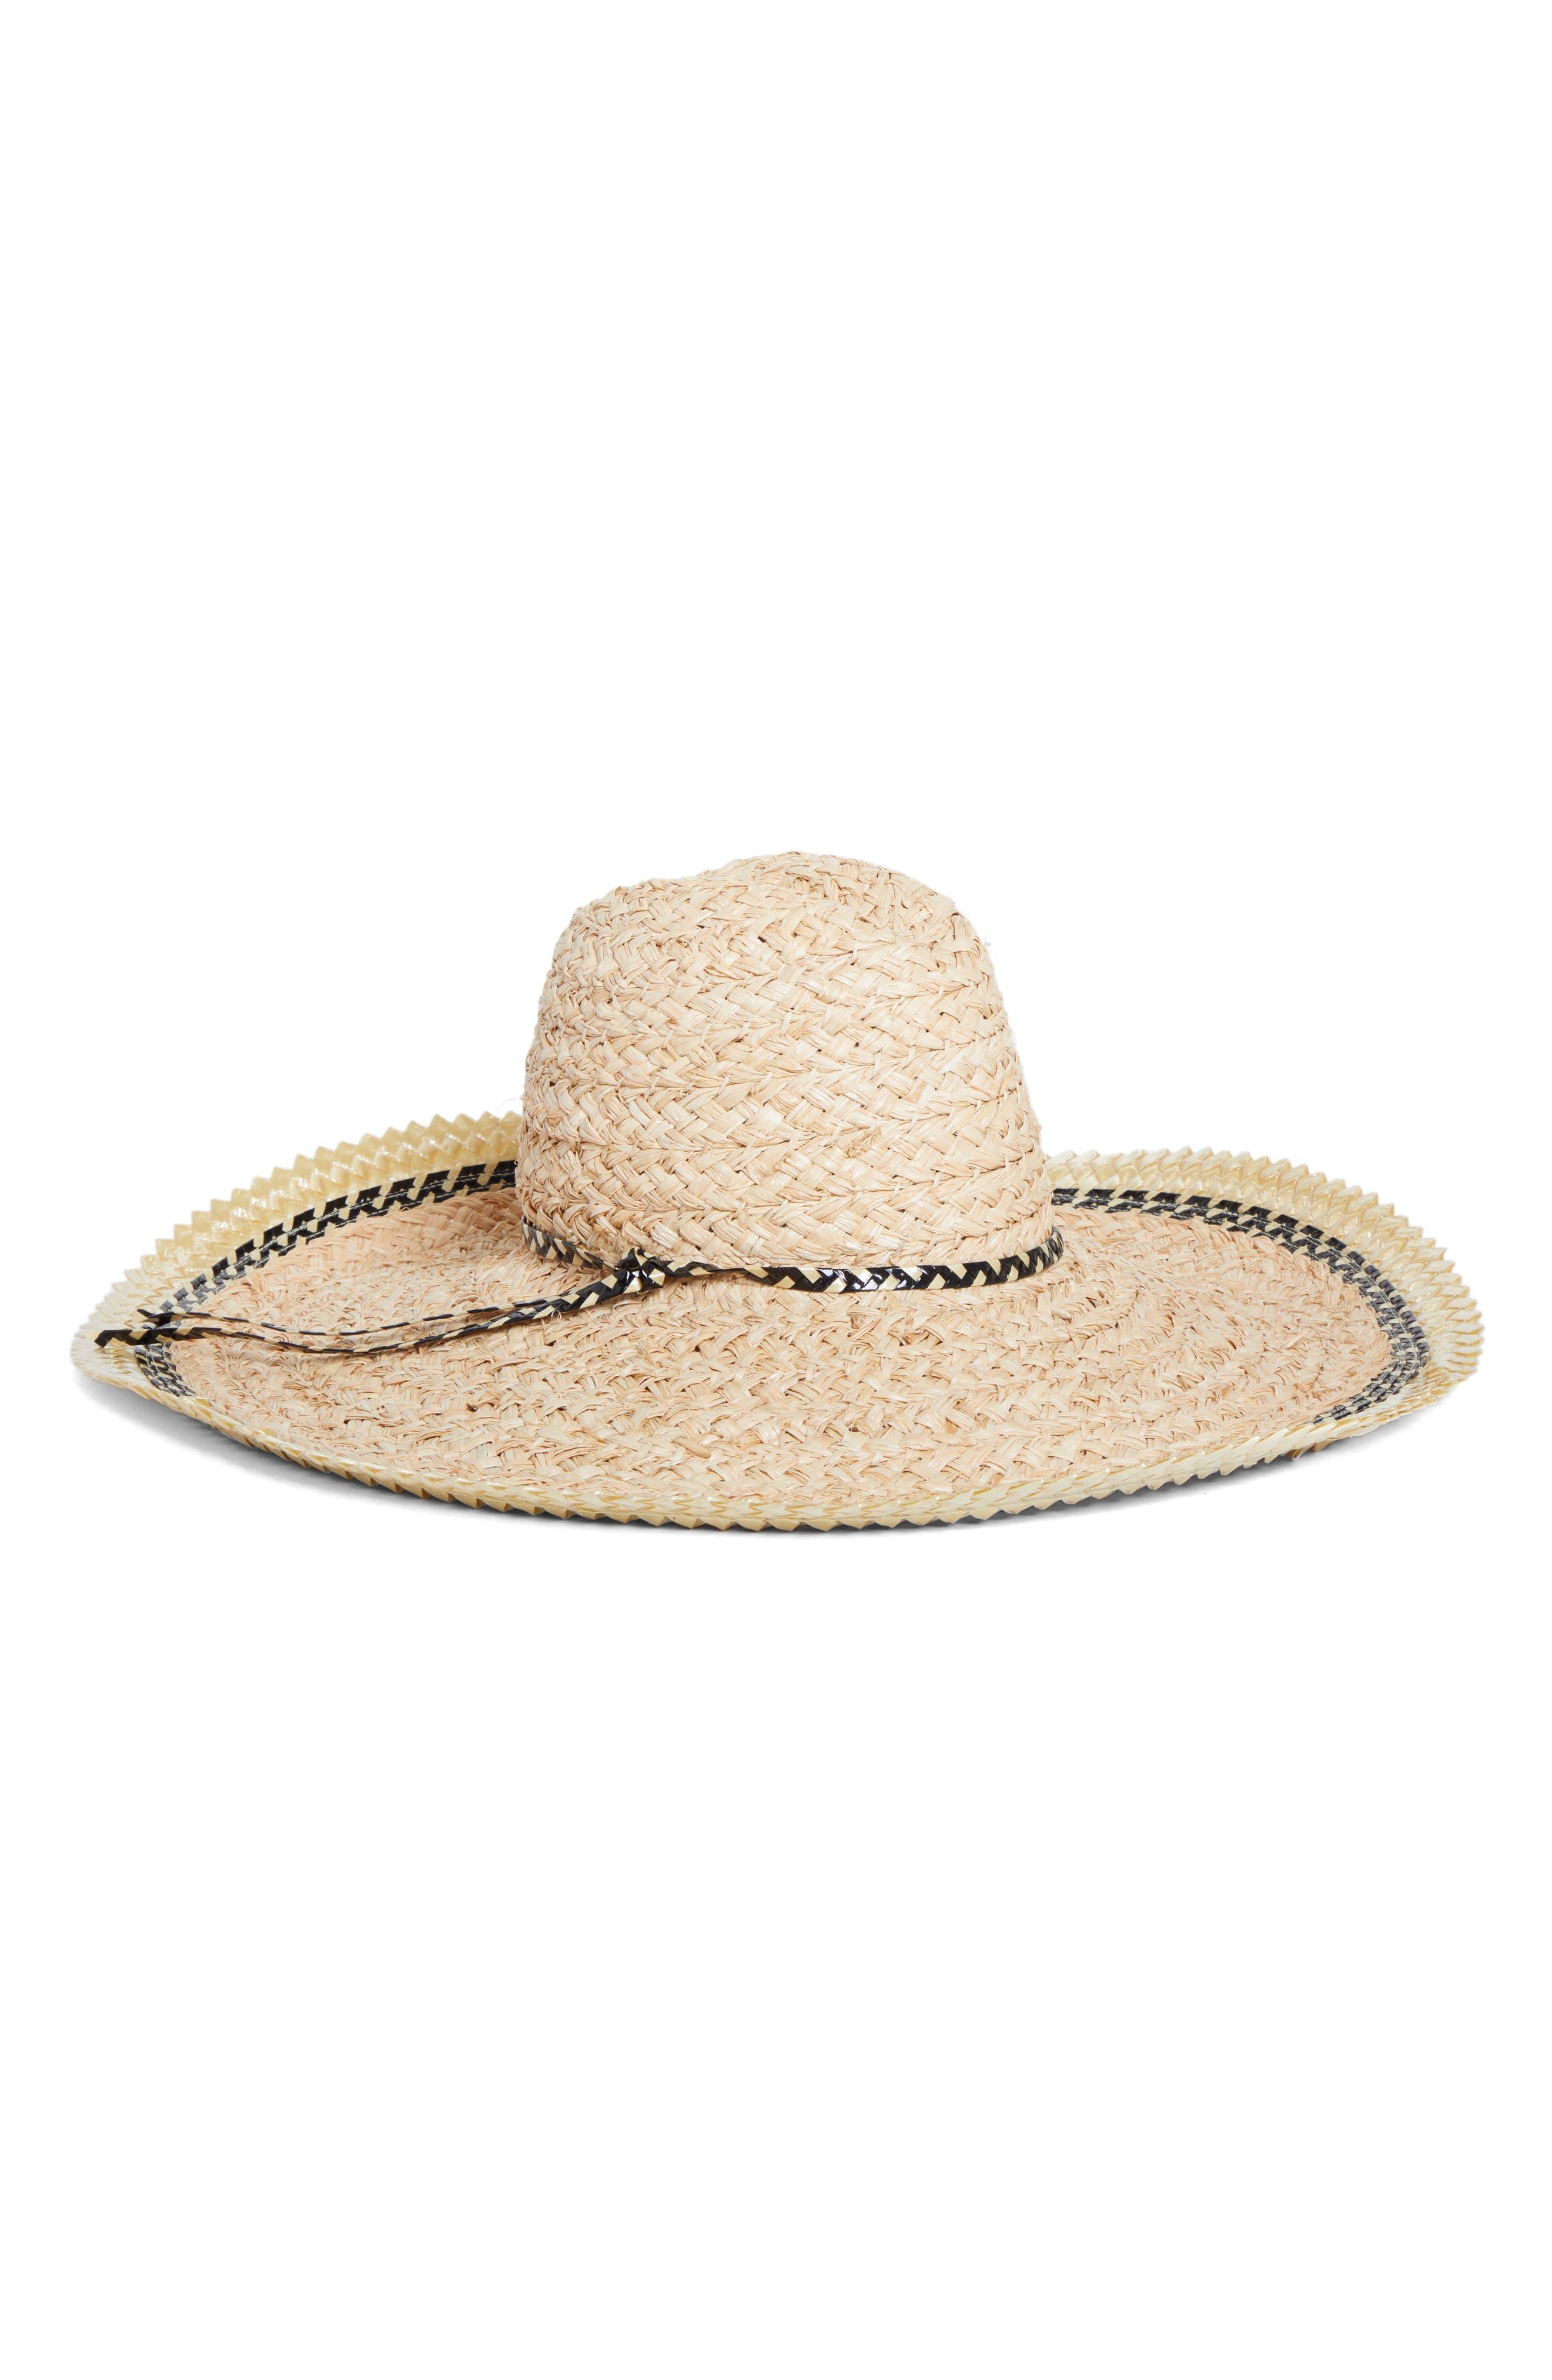 GIGI BURRIS MILLINERY Pacific Straw Hat, Main, color, NATURAL/ BLACK